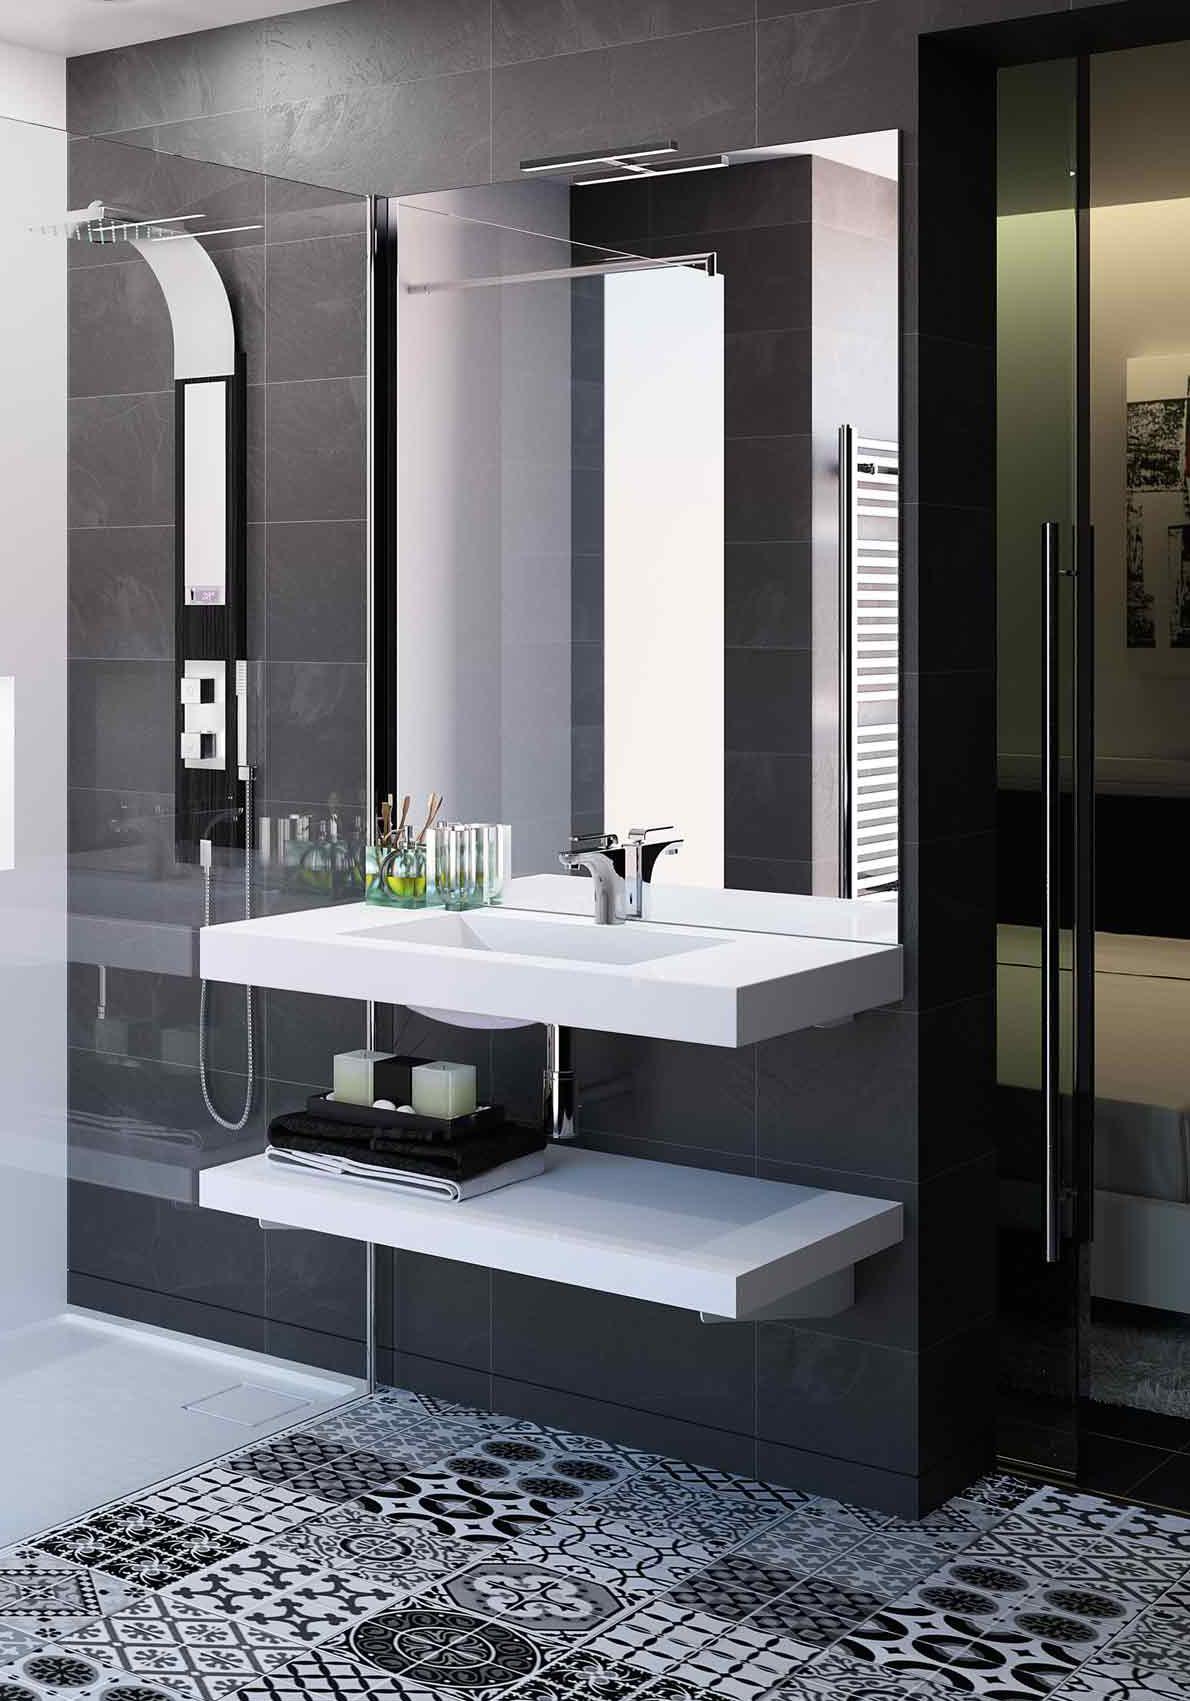 Mobilier Salles de bain à Marignane, Martigues, Aix en ...